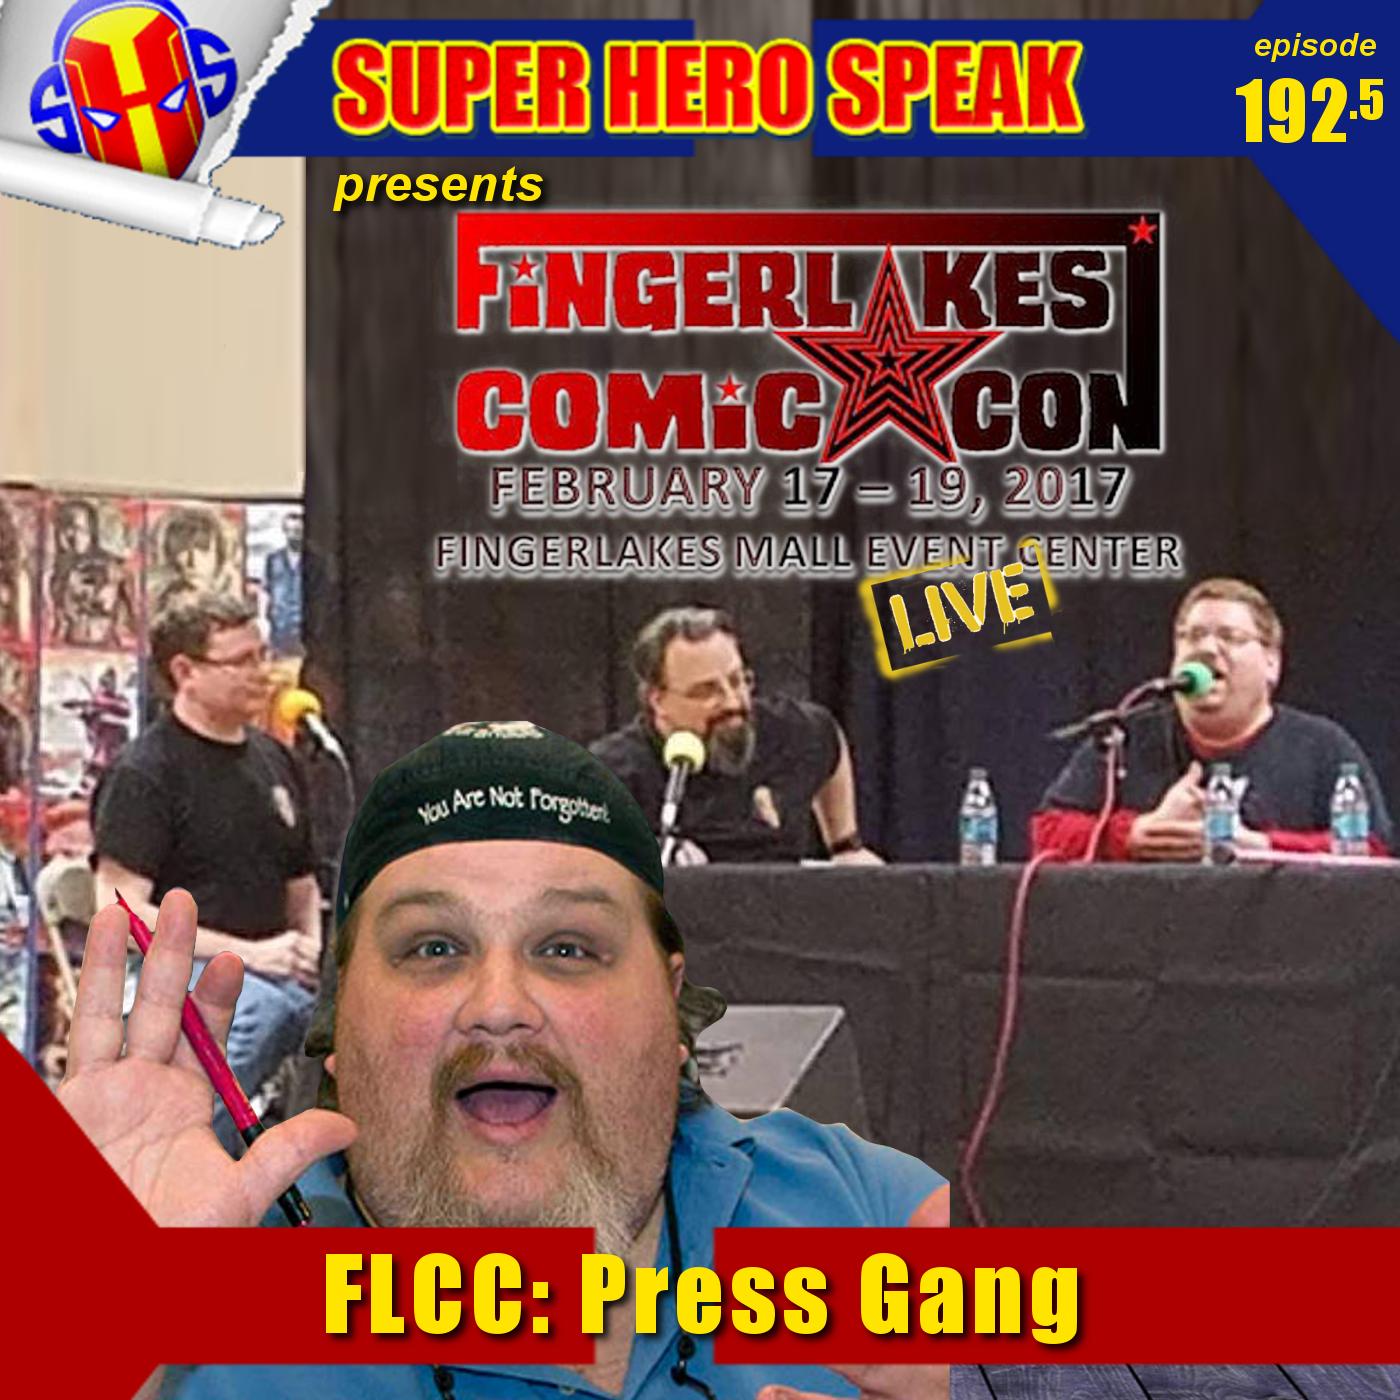 #192.5: FLCC Press Gang